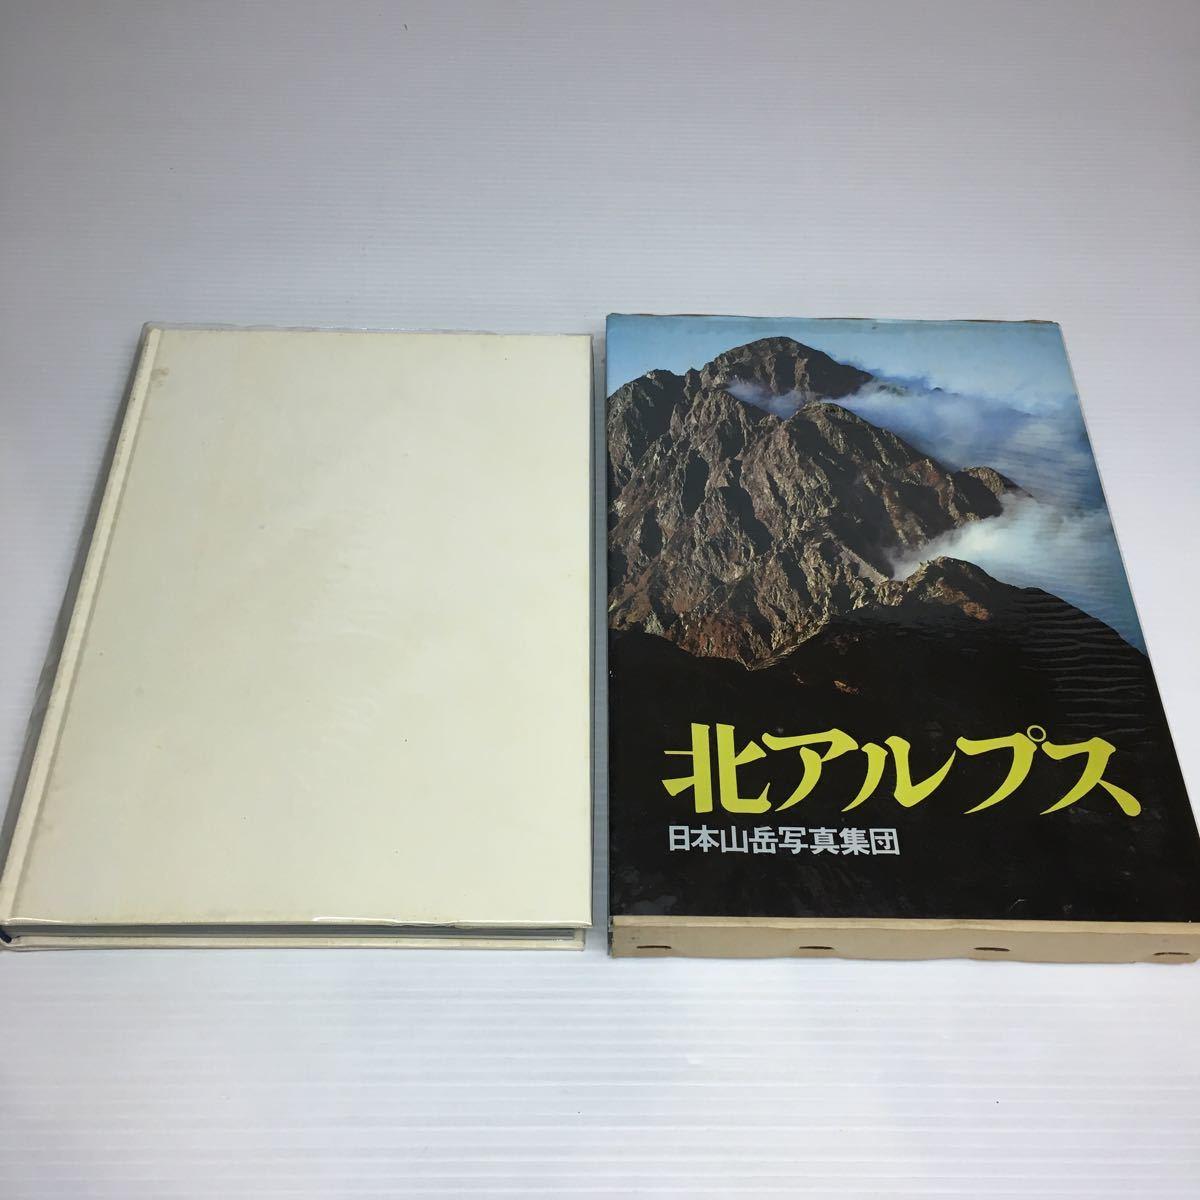 x2/北アルプス 日本山岳写真集団 昭和54年初版 定価8000円_画像3